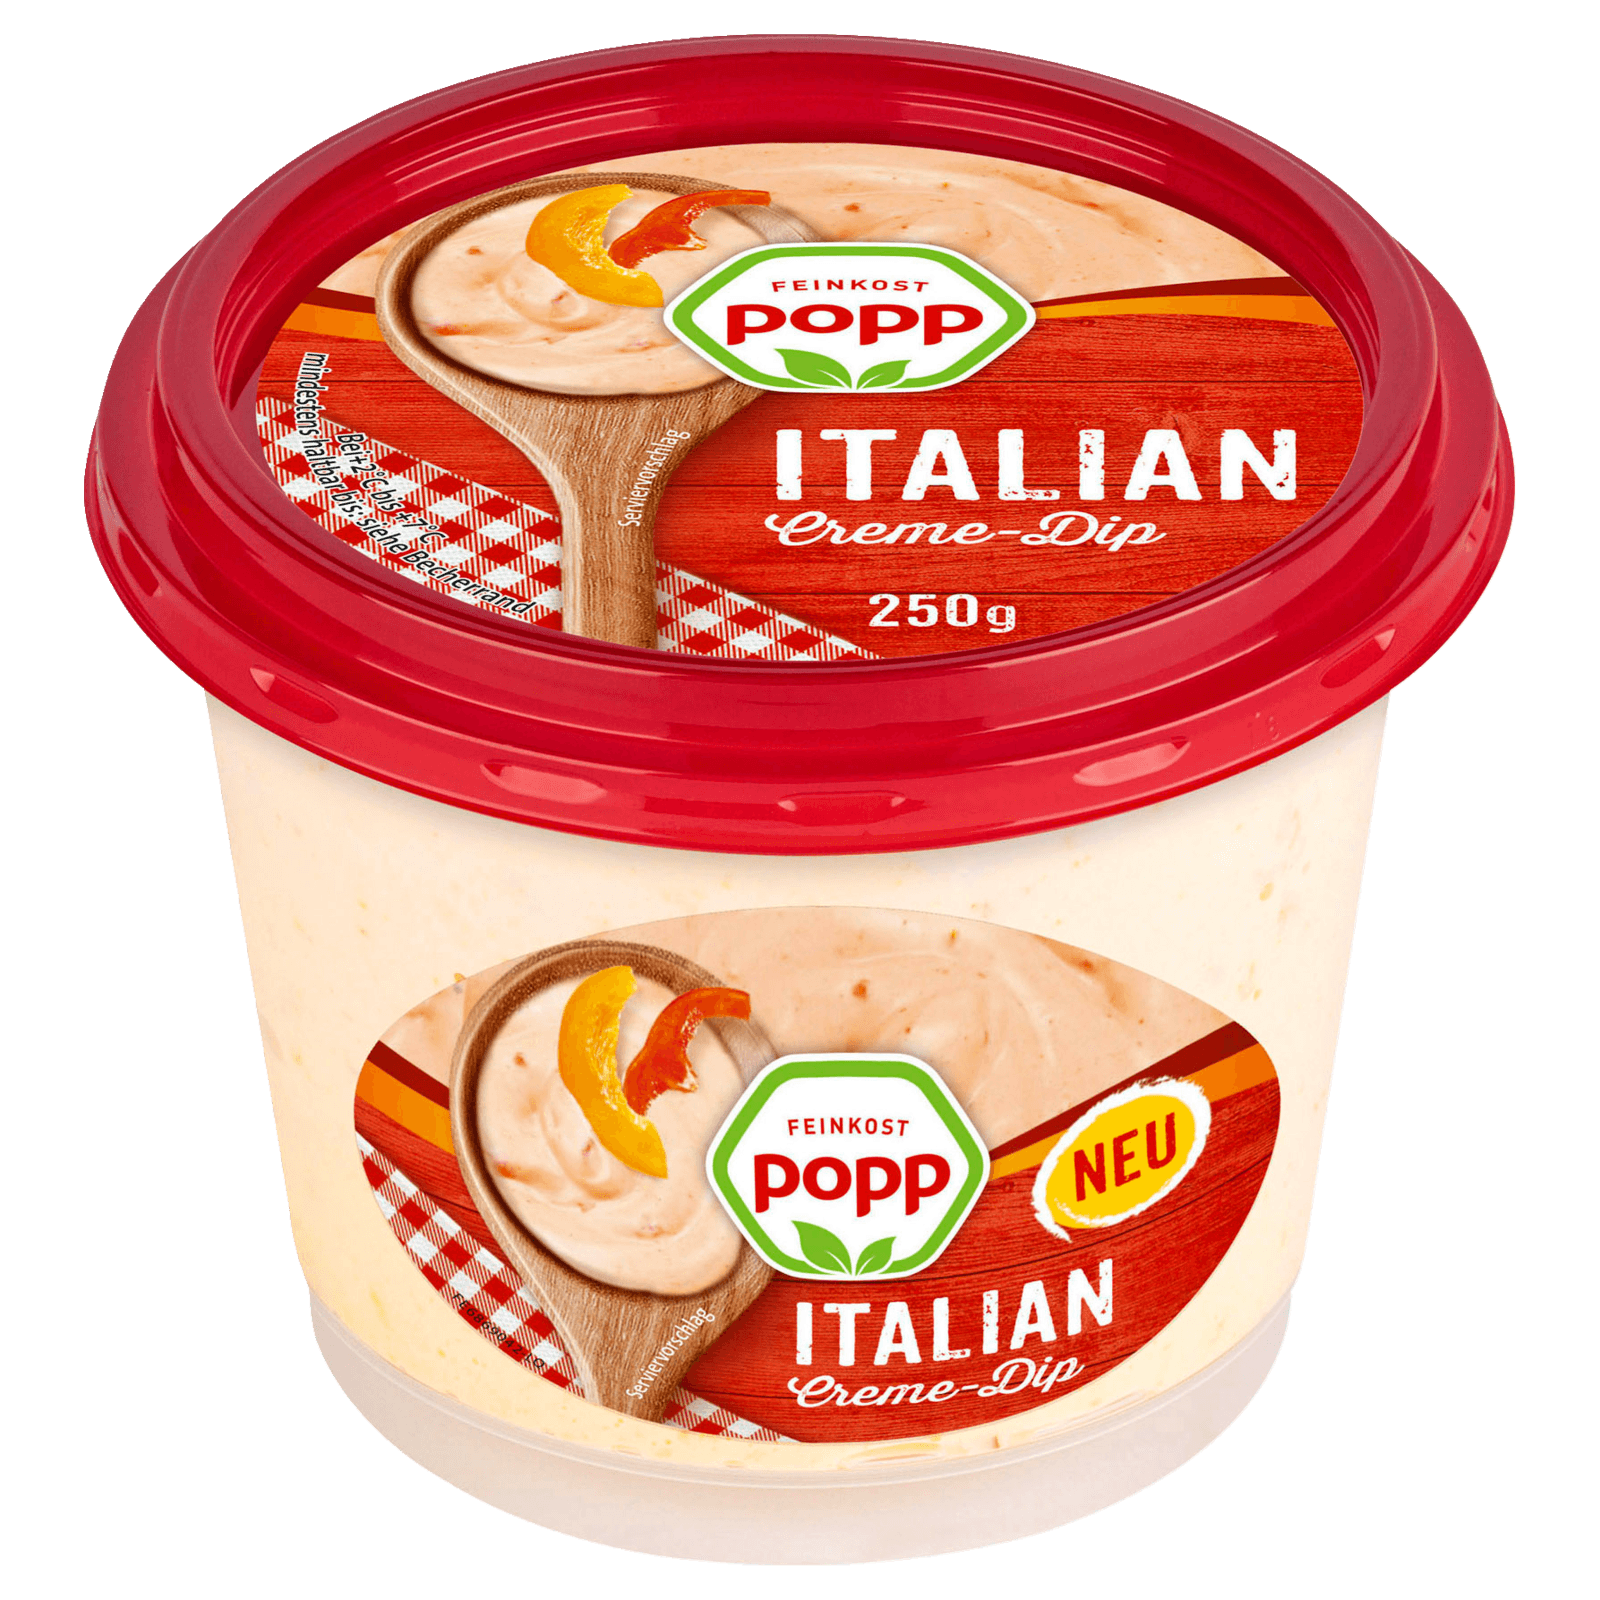 Feinkost Popp Italina Creme Dip